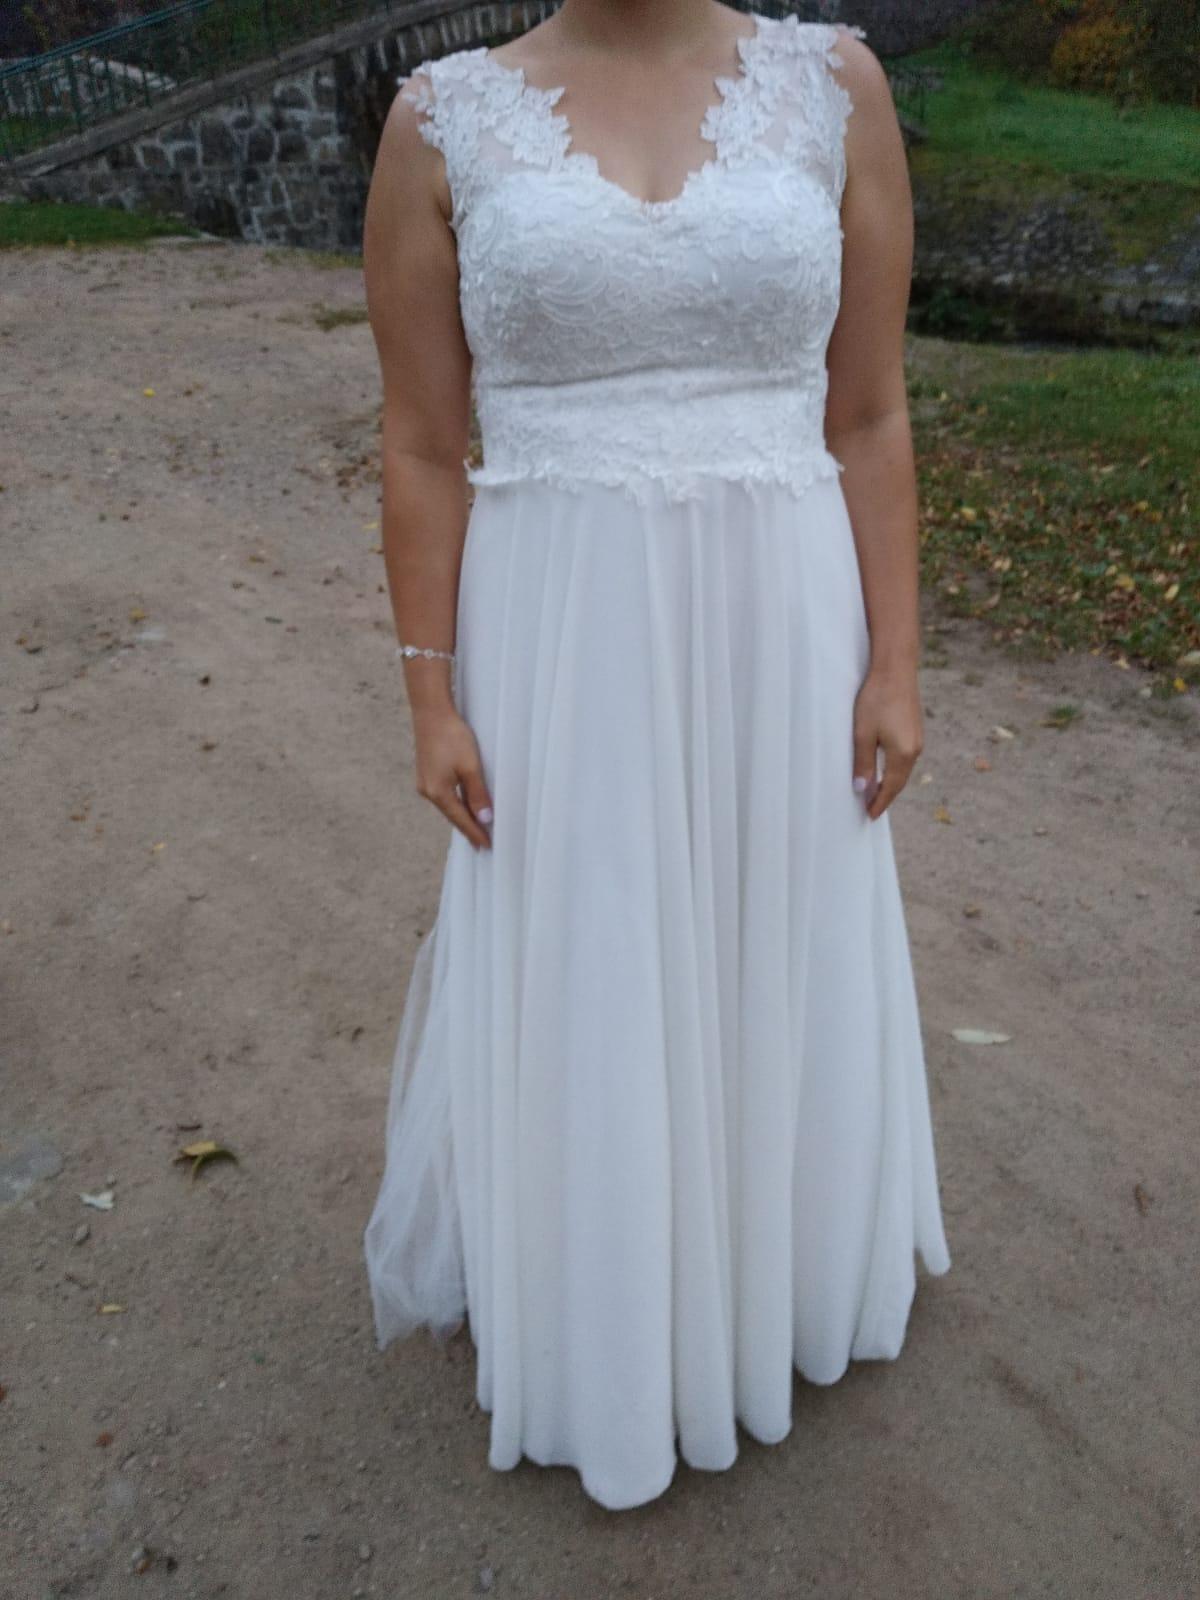 e2cfe0a226 Suknia ślubna i szal z norki - Trzebnica - Dolnośląskie - Suknie ...